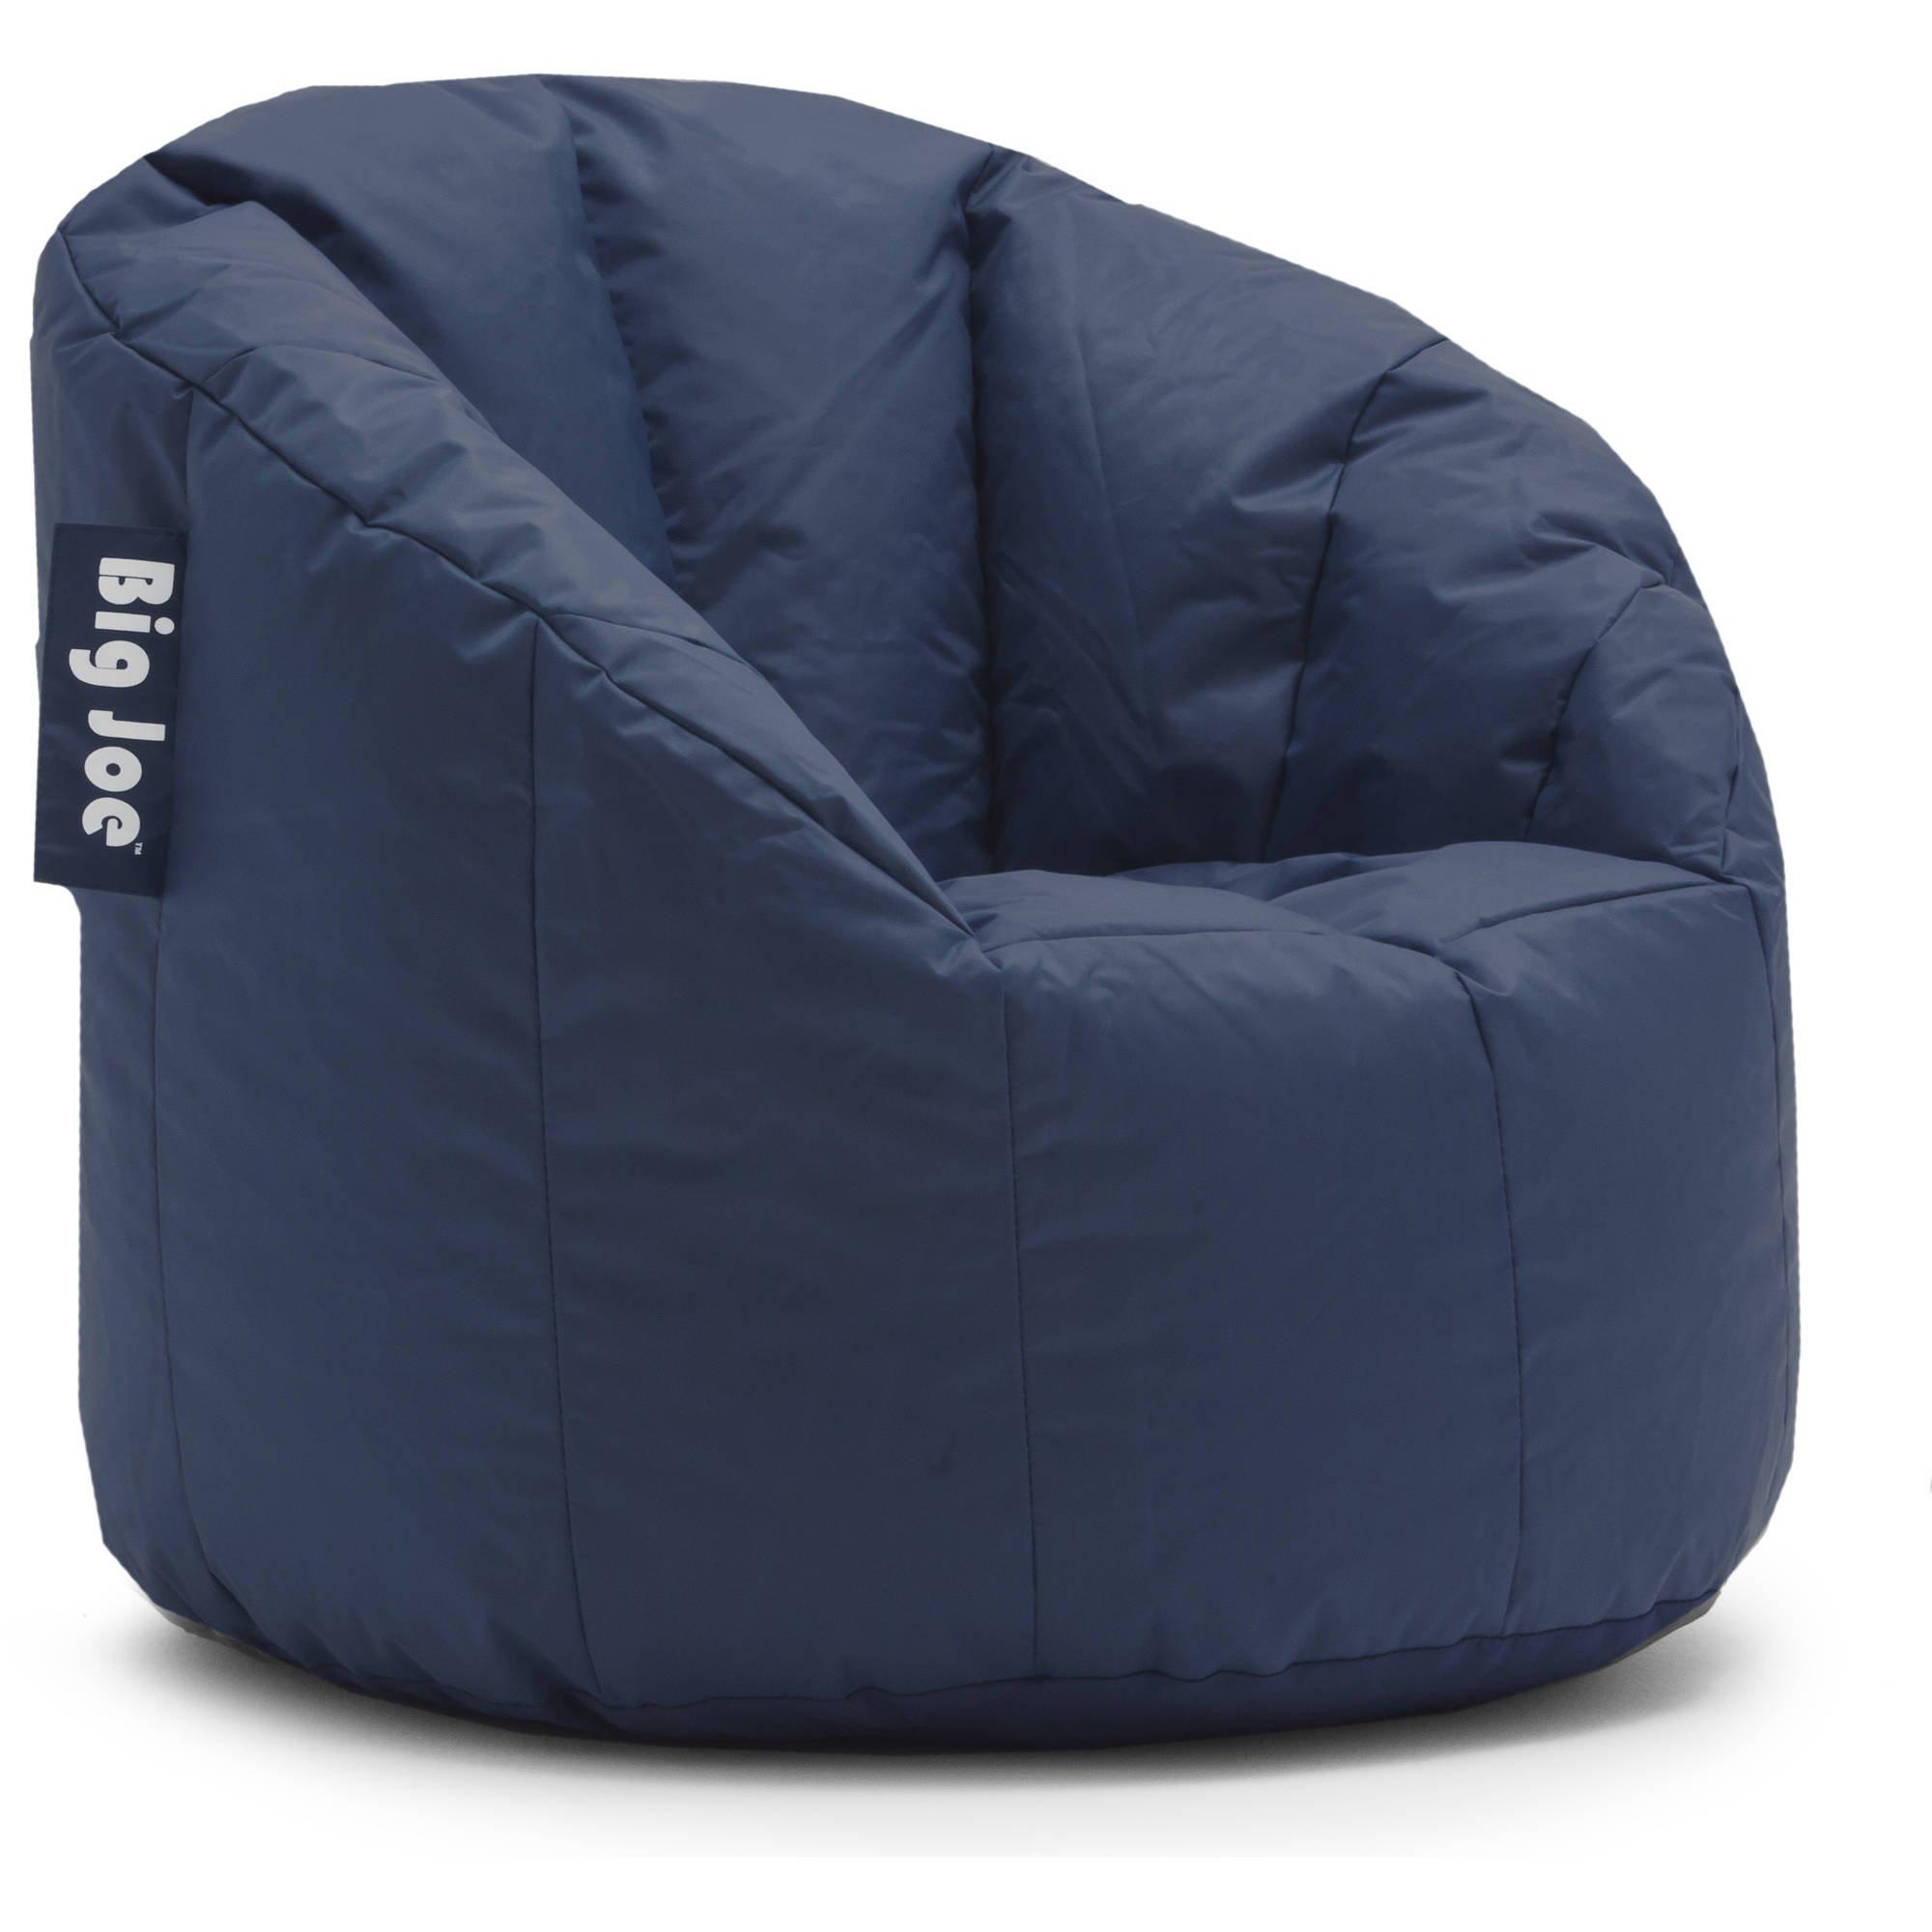 Big Joe Ultimate Comfort Multiple